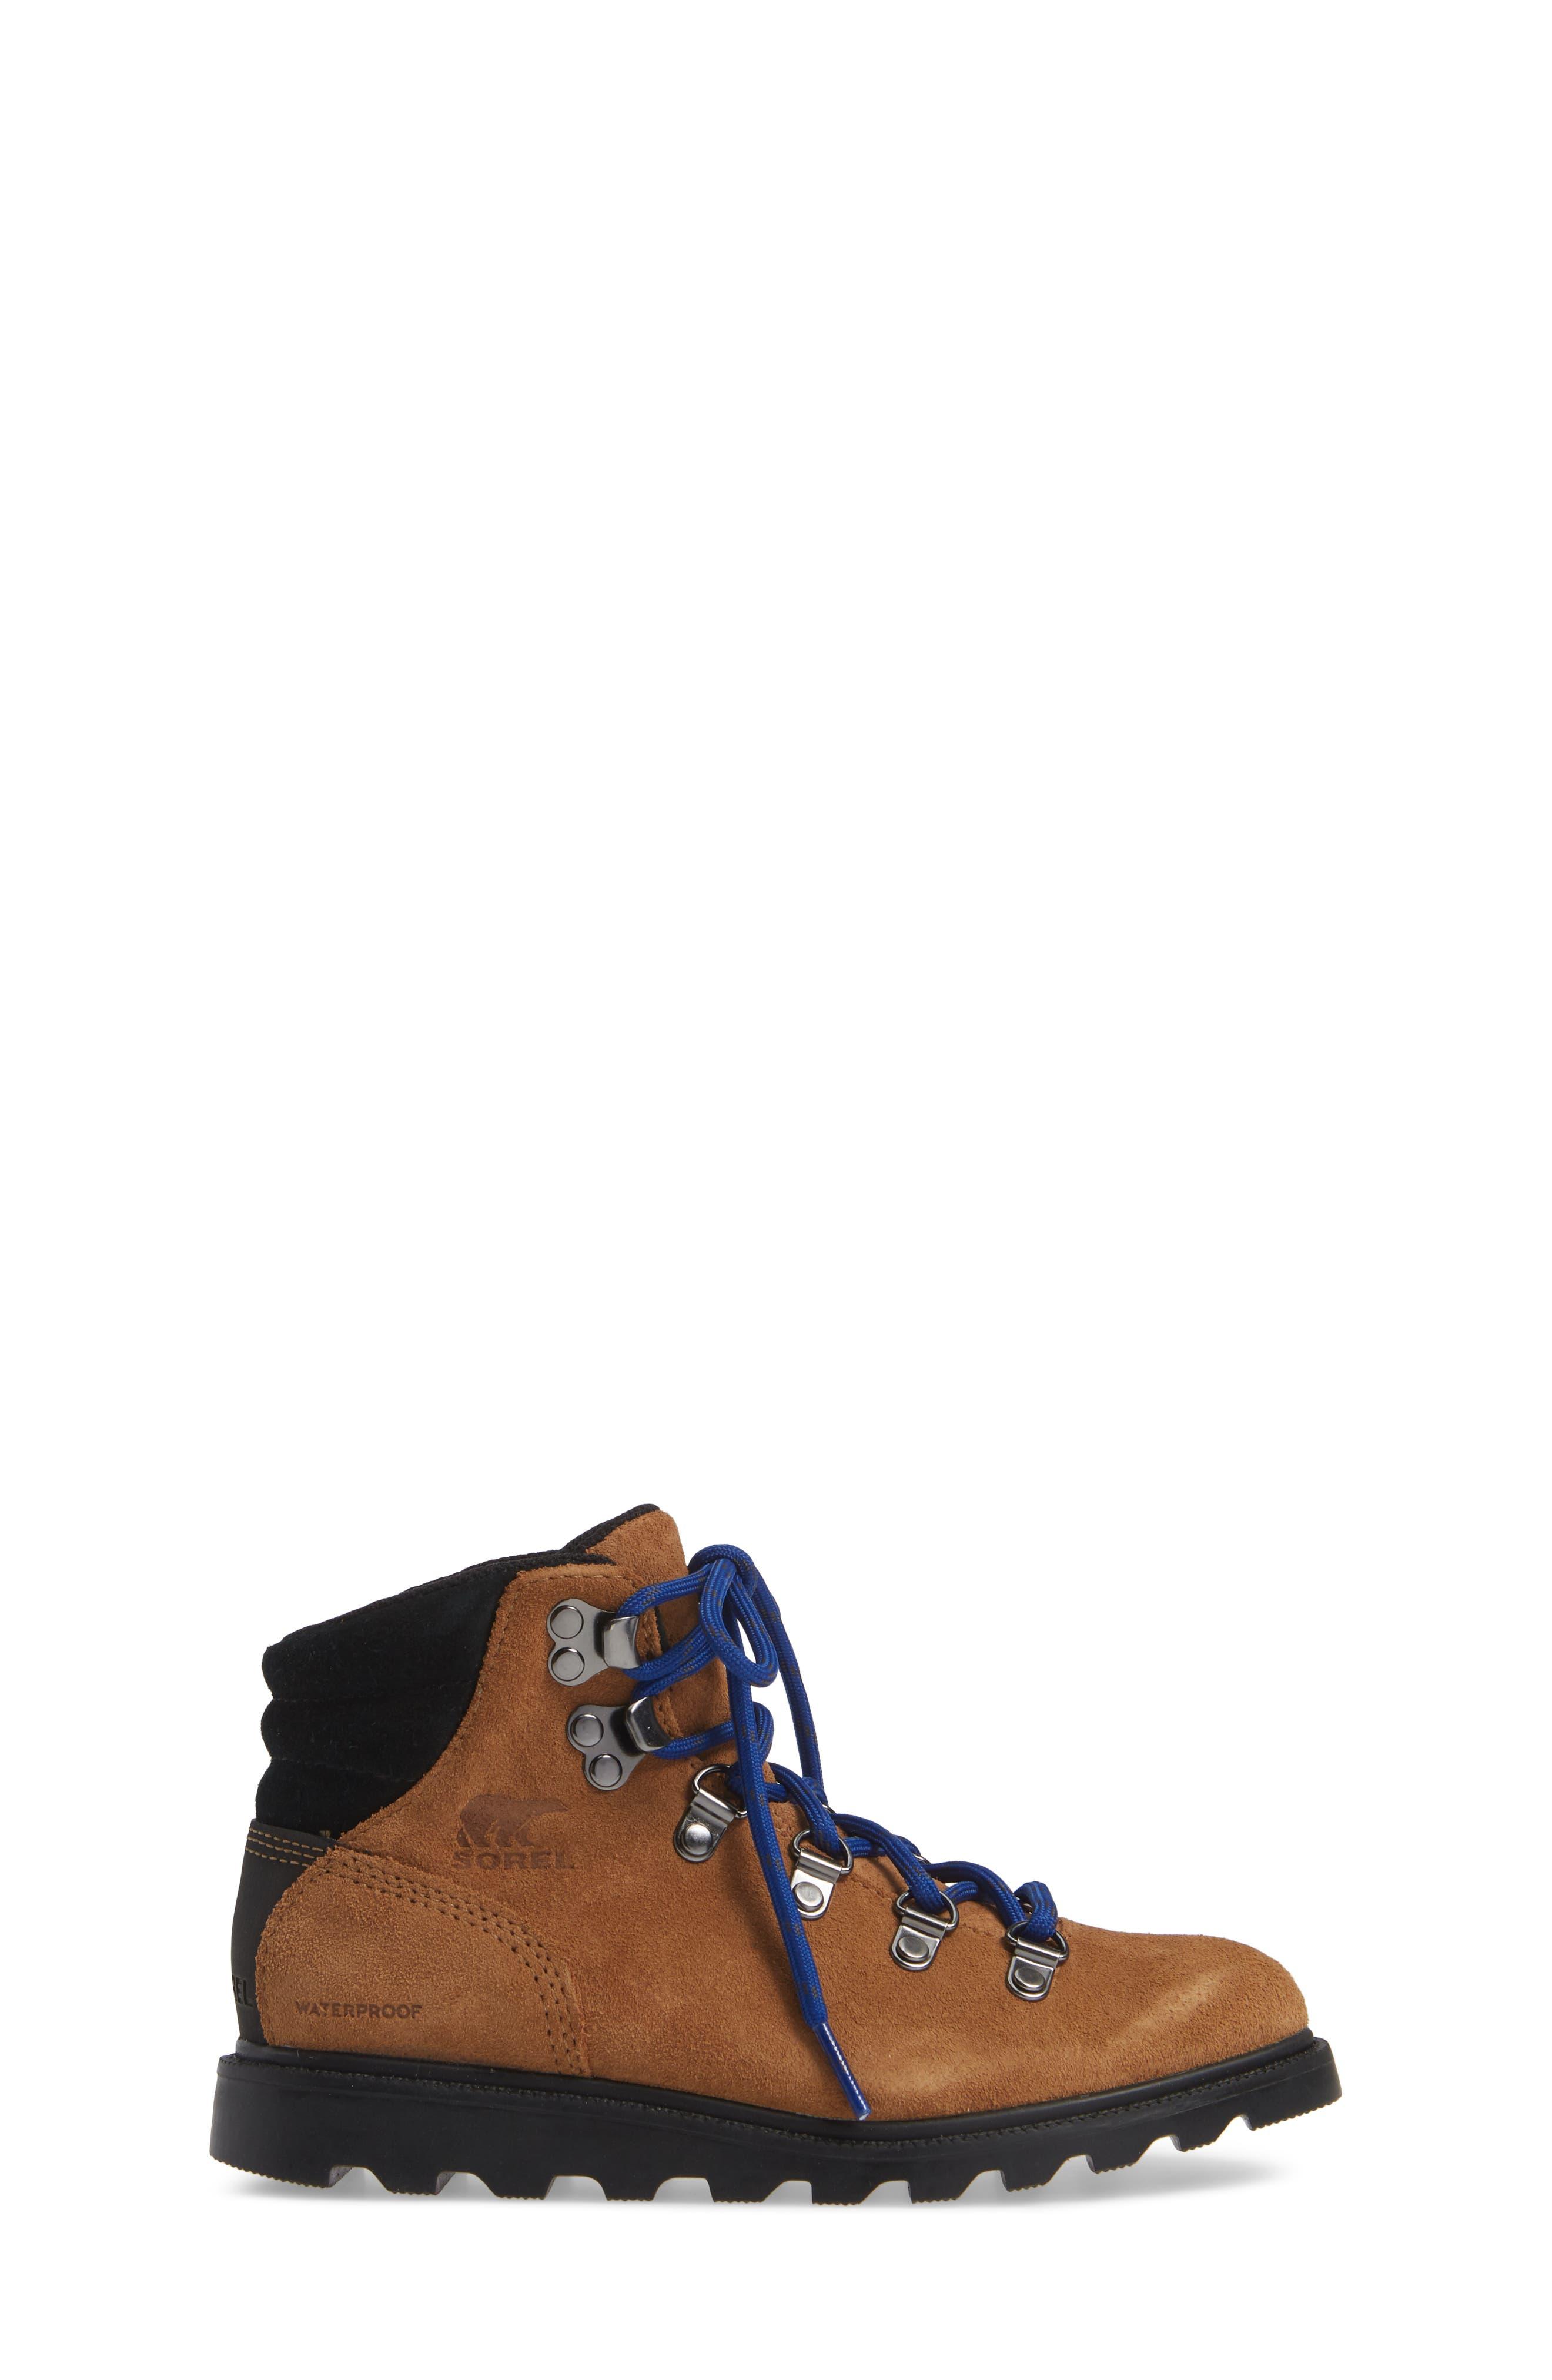 Madison Waterproof Hiker Boot,                             Alternate thumbnail 3, color,                             CAMEL BROWN/ BLACK